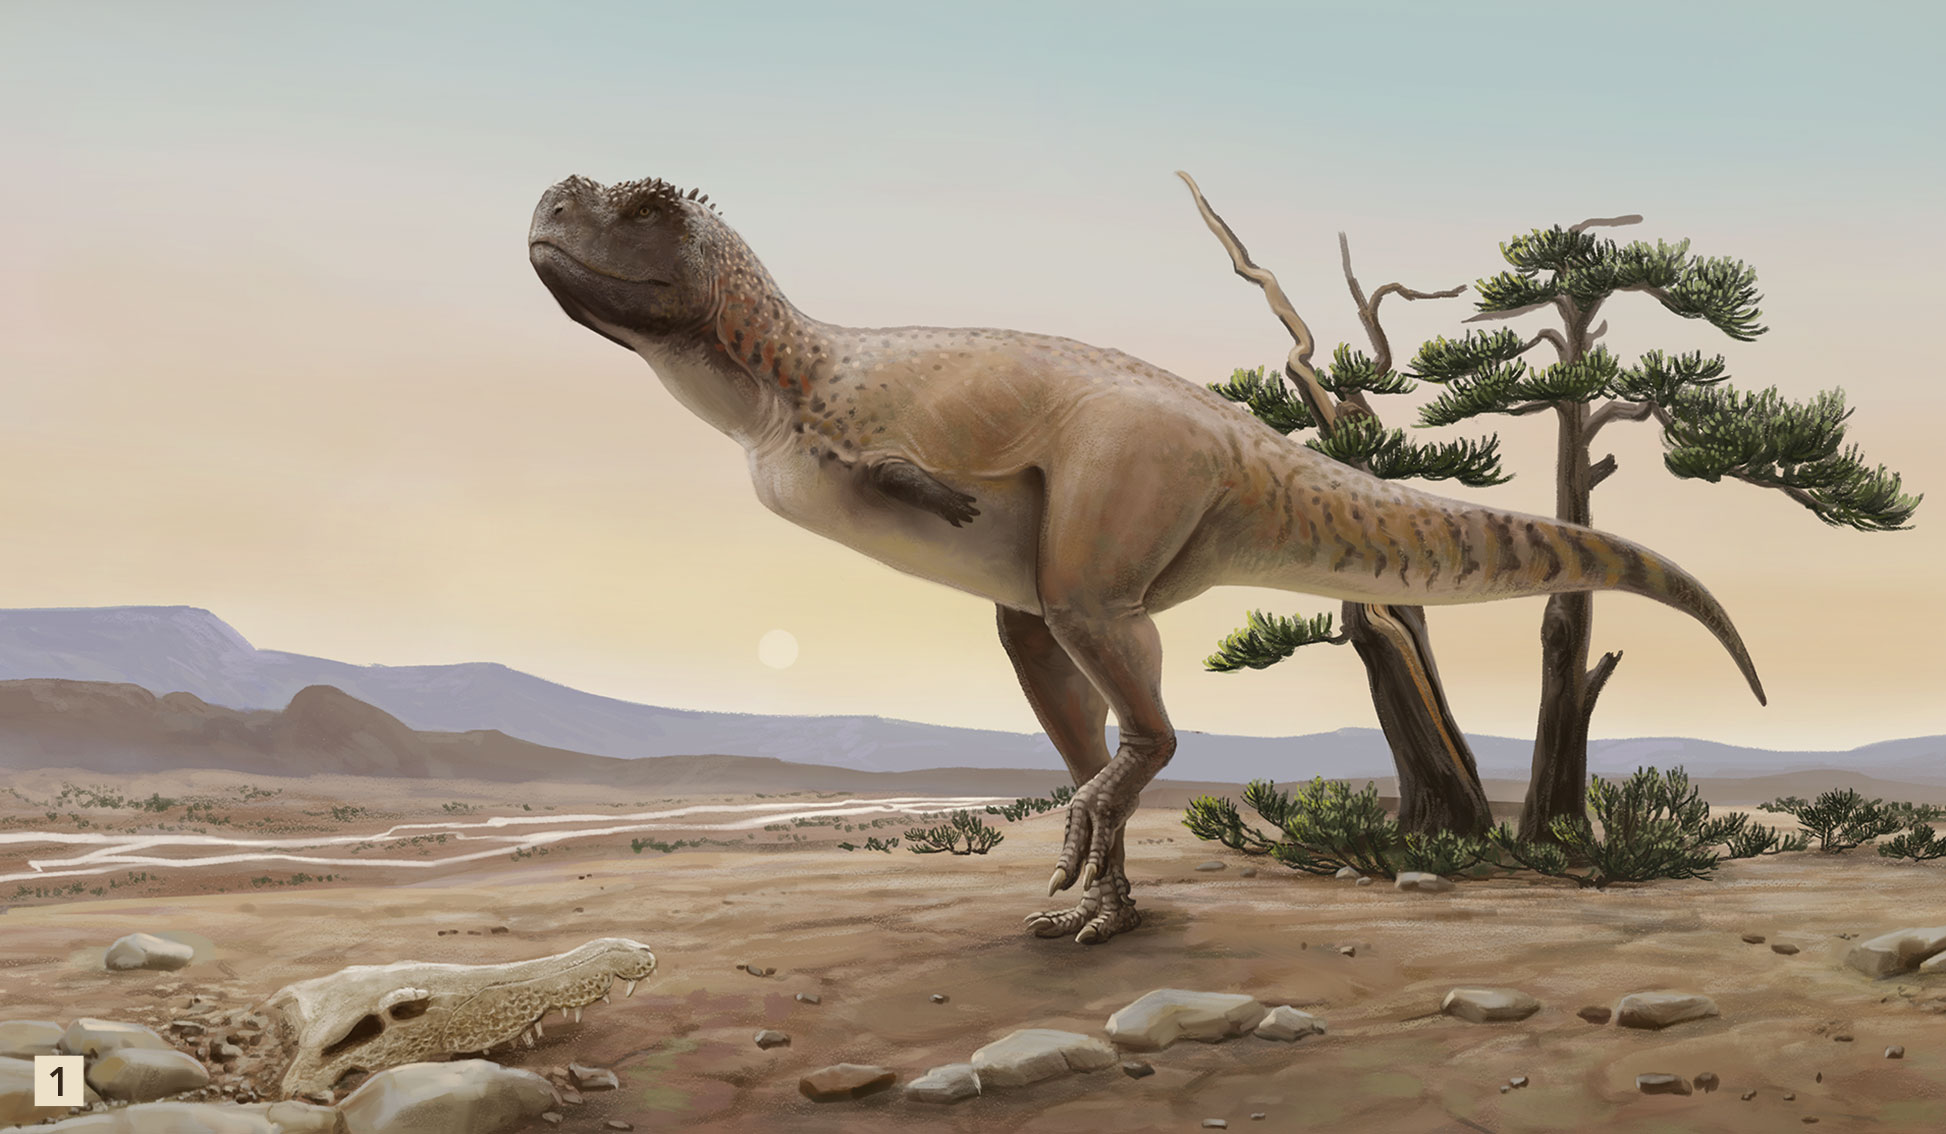 Kurupi itaata – Un dinosaurio abelisaurido del final de la Era Mesozoica en Brasil